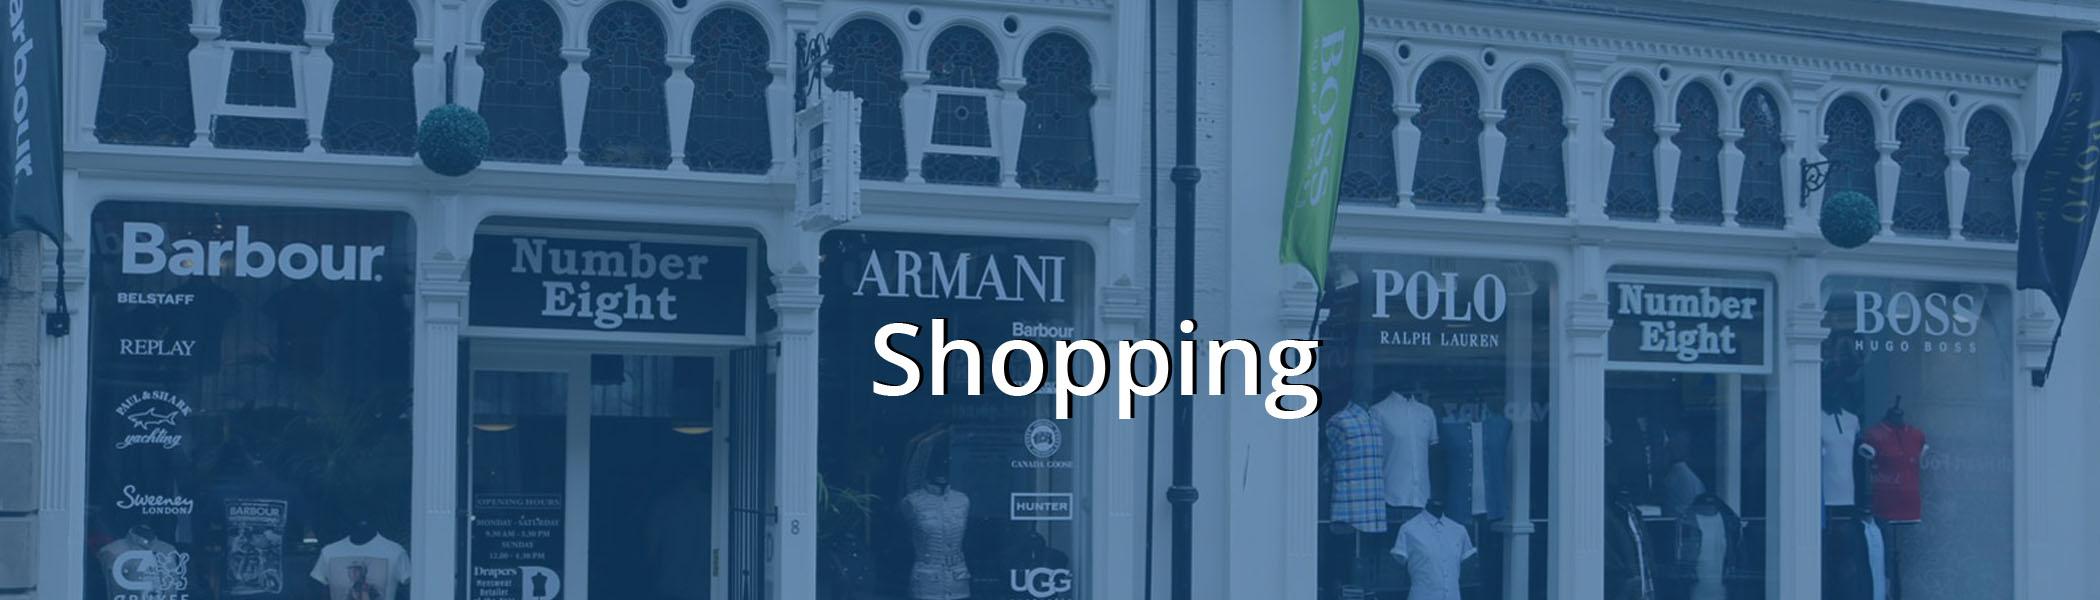 Bishopbriggs Loves Local Shopping